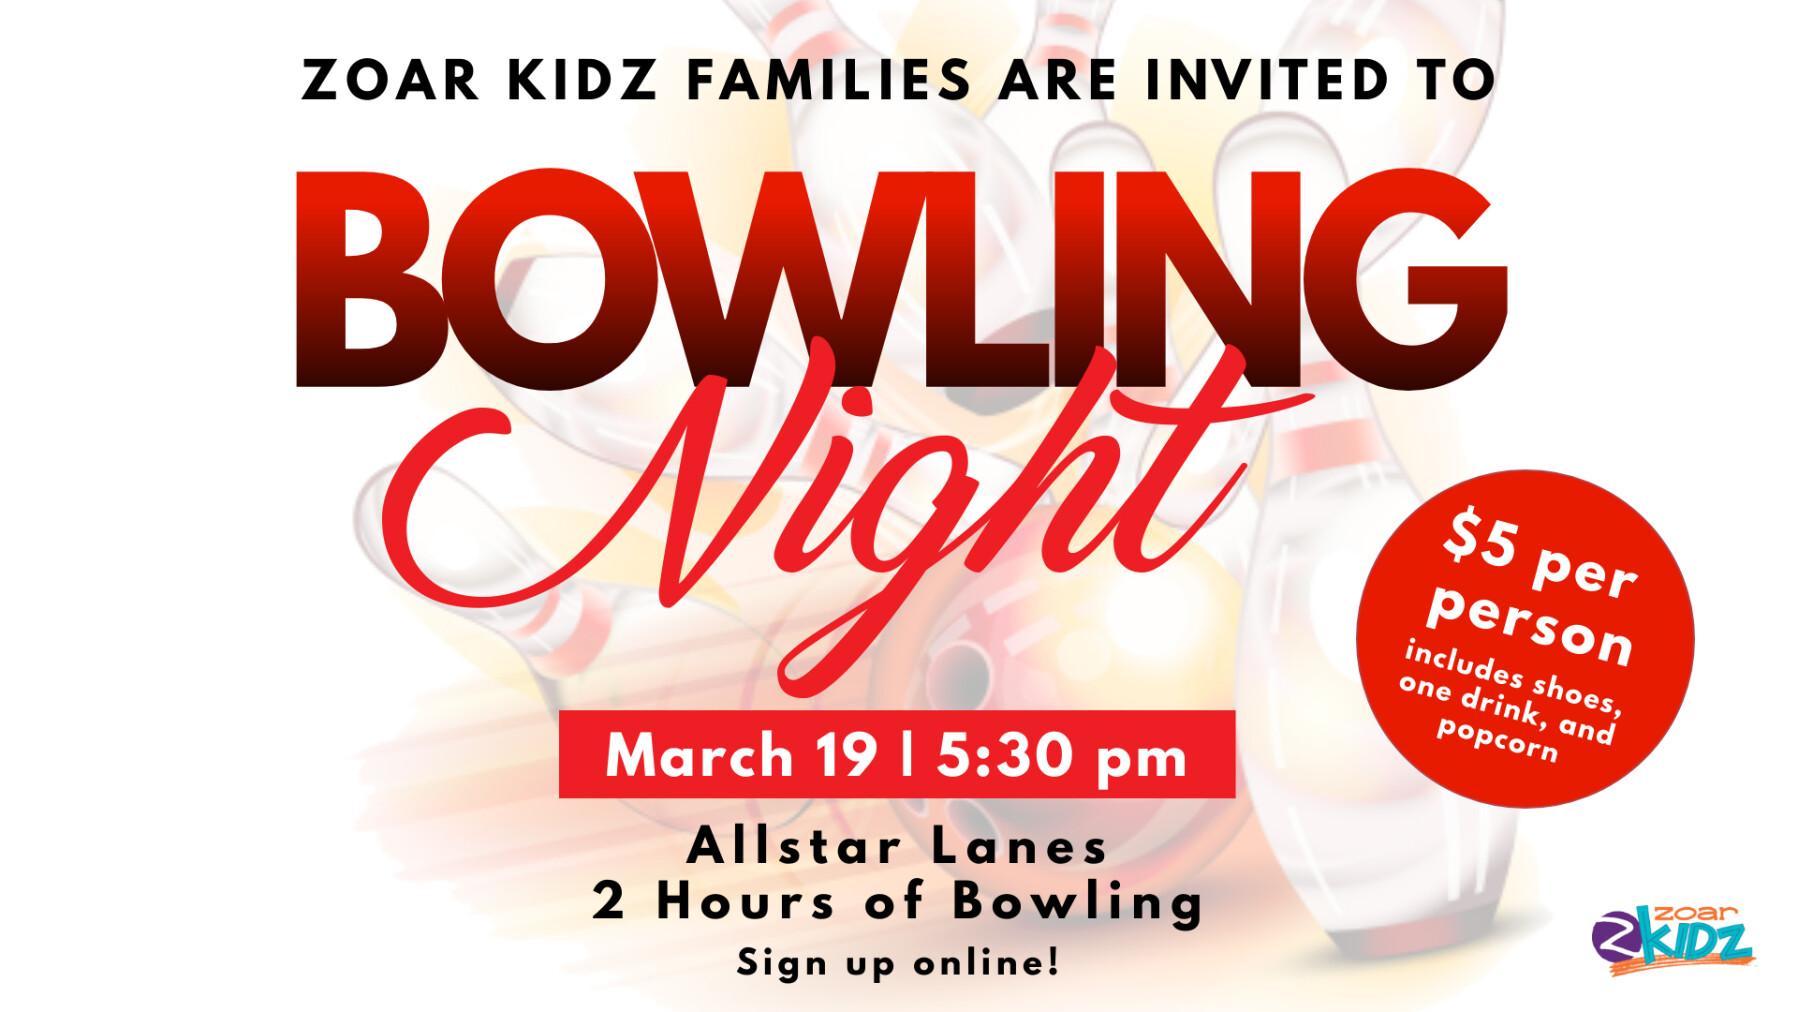 Zoar Kidz Bowling Night